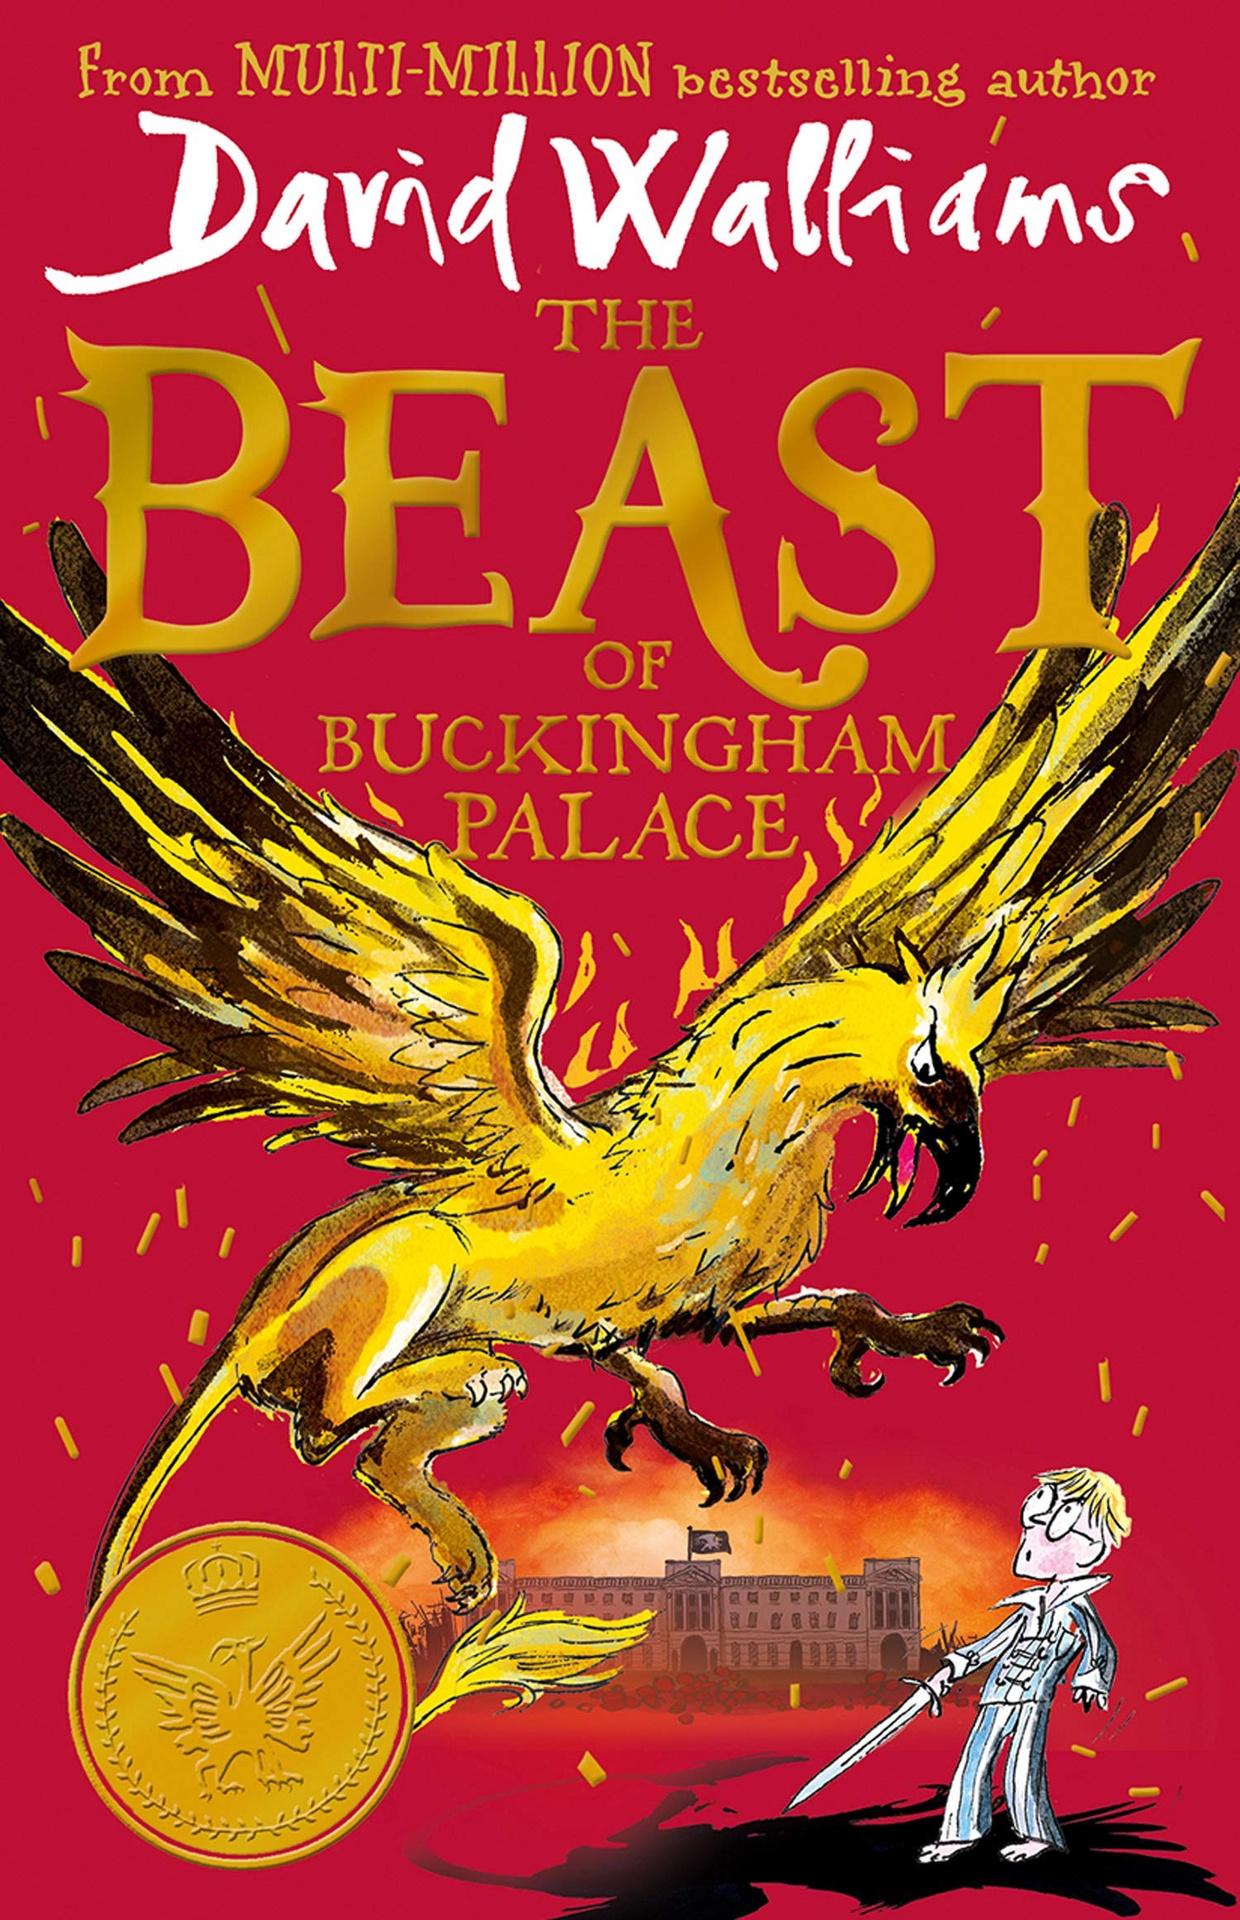 BEAST OF BUCKINGHAM PALACE (PB)